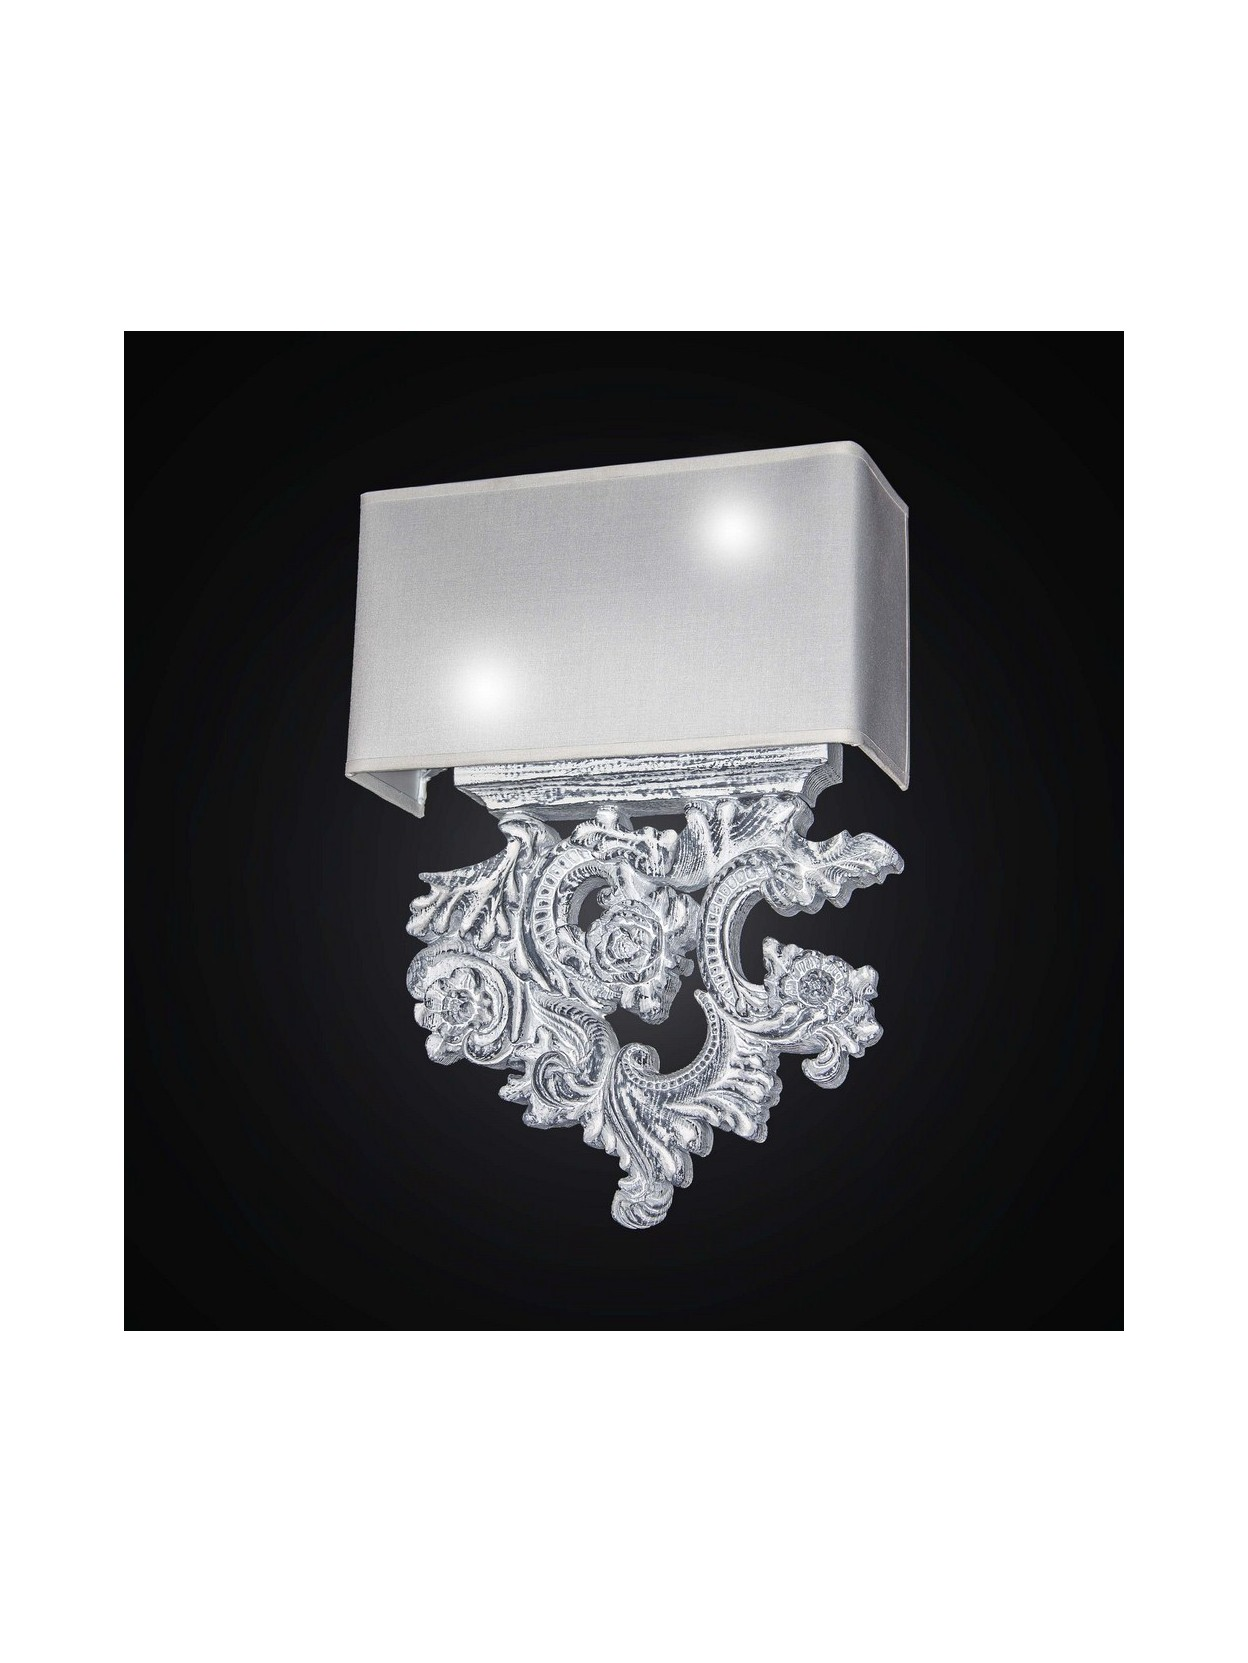 Shabby Chic E Moderno.Shabby Chic Modern Wooden Wall Light 2 Lights Bga 2657 Ac